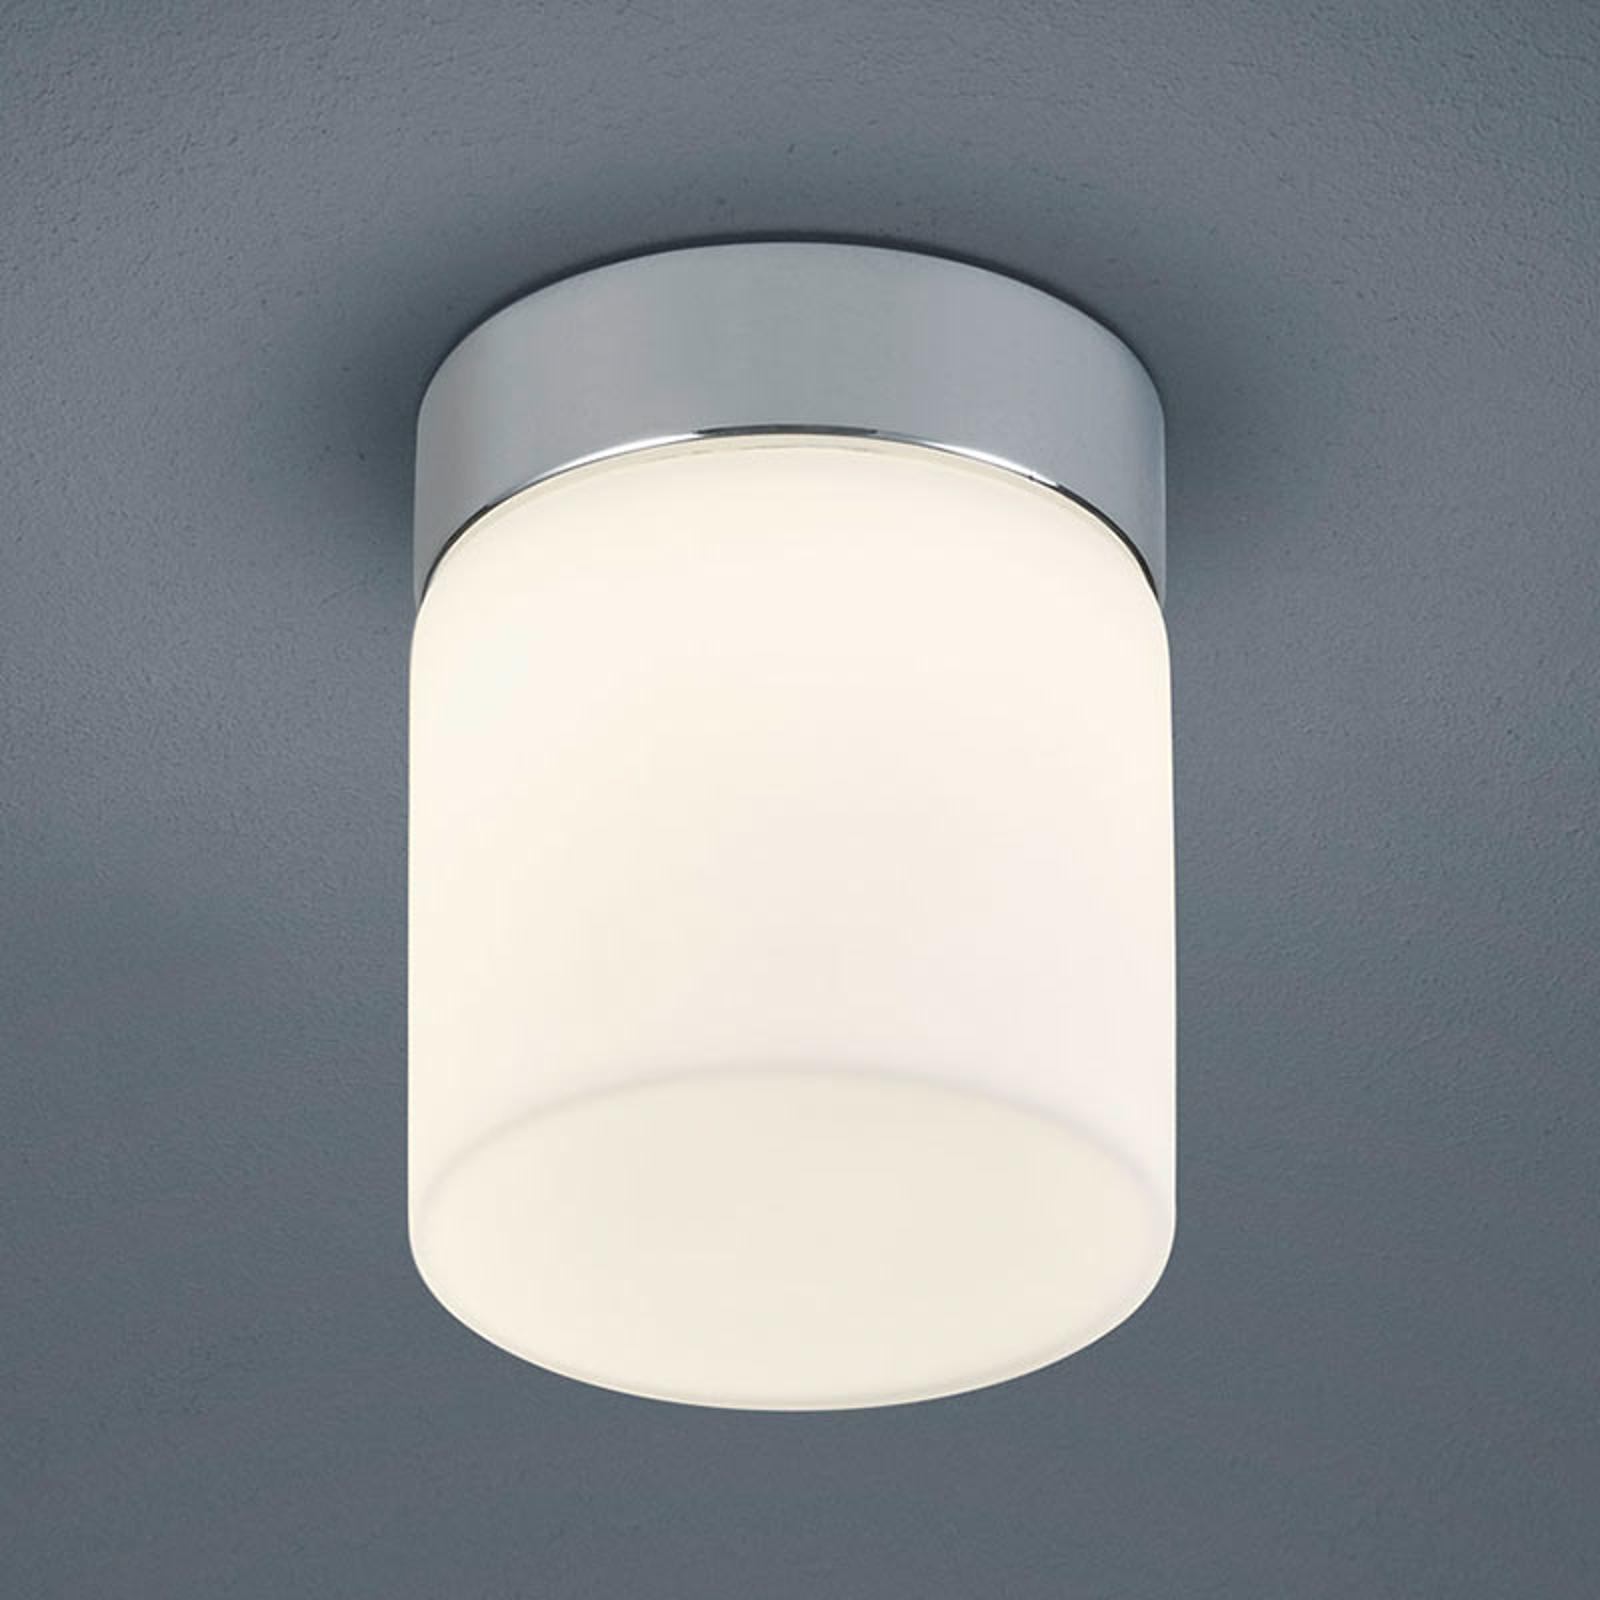 Helestra Keto - LED-Bad-Deckenleuchte, Zylinder